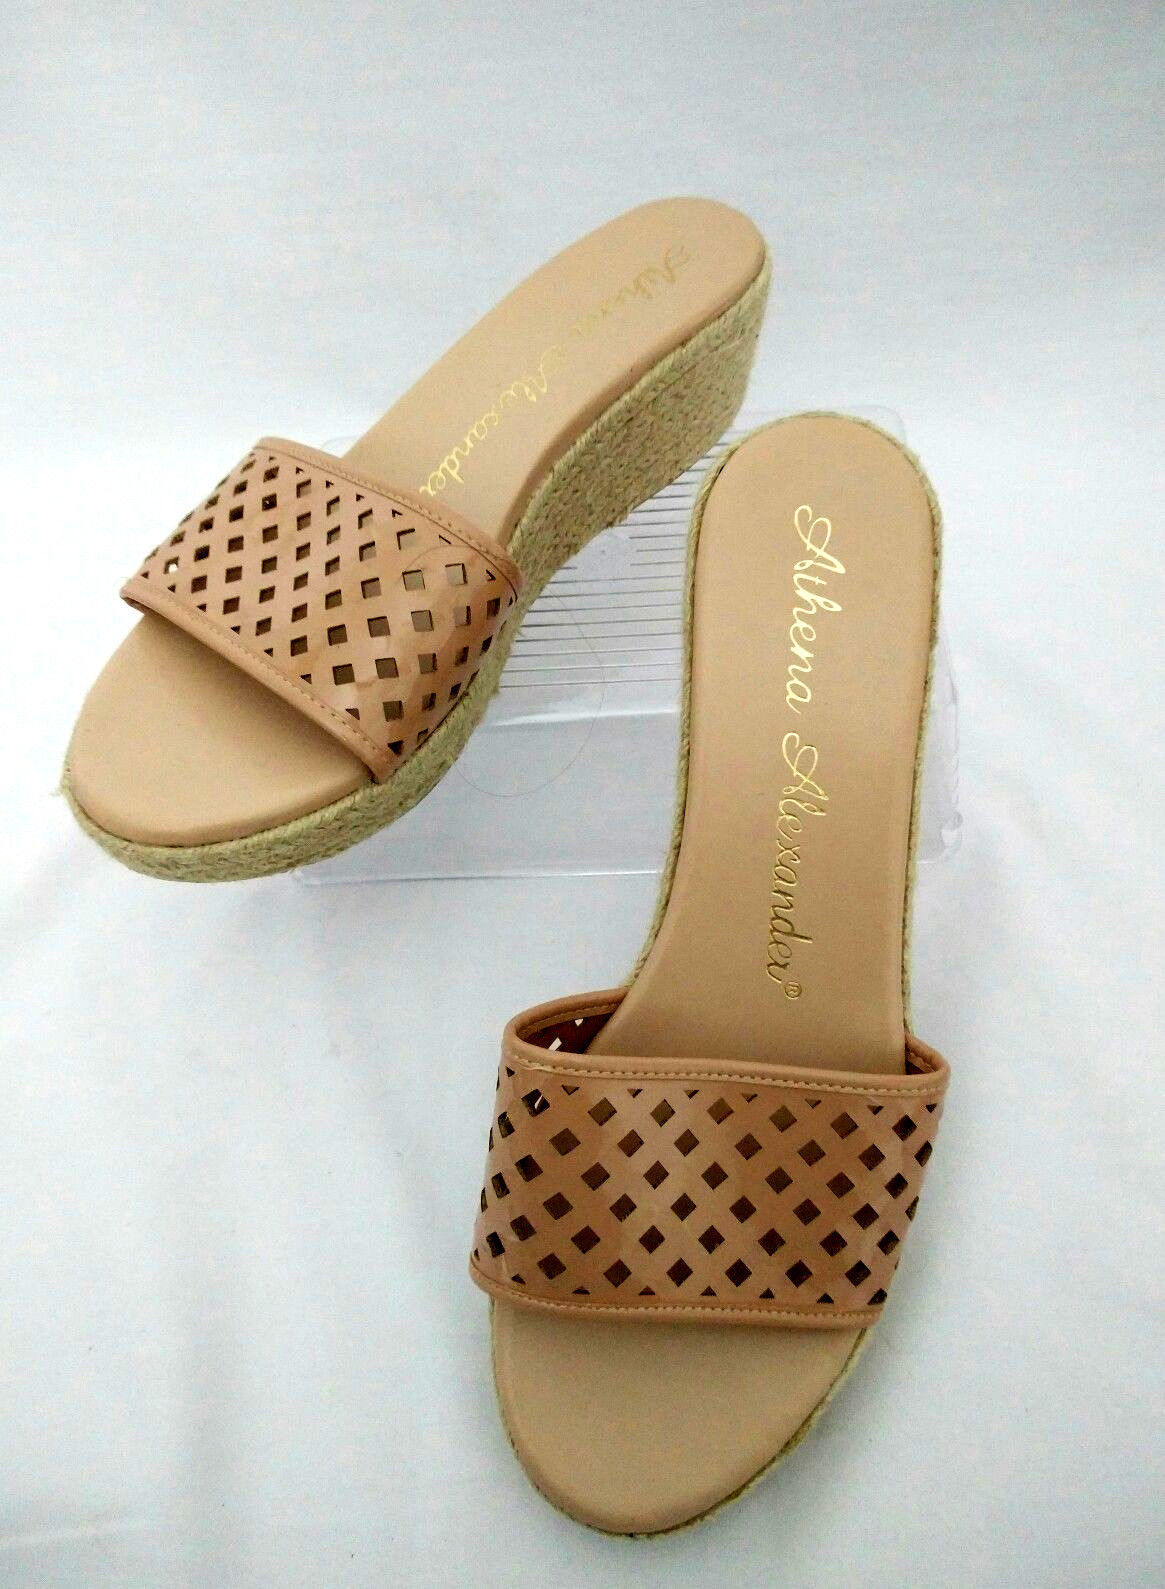 529288f39 S l1600. S l1600. Previous. Athena Alexander Womens 10 Beige Platform Wedge  Sandals Slide Slippers